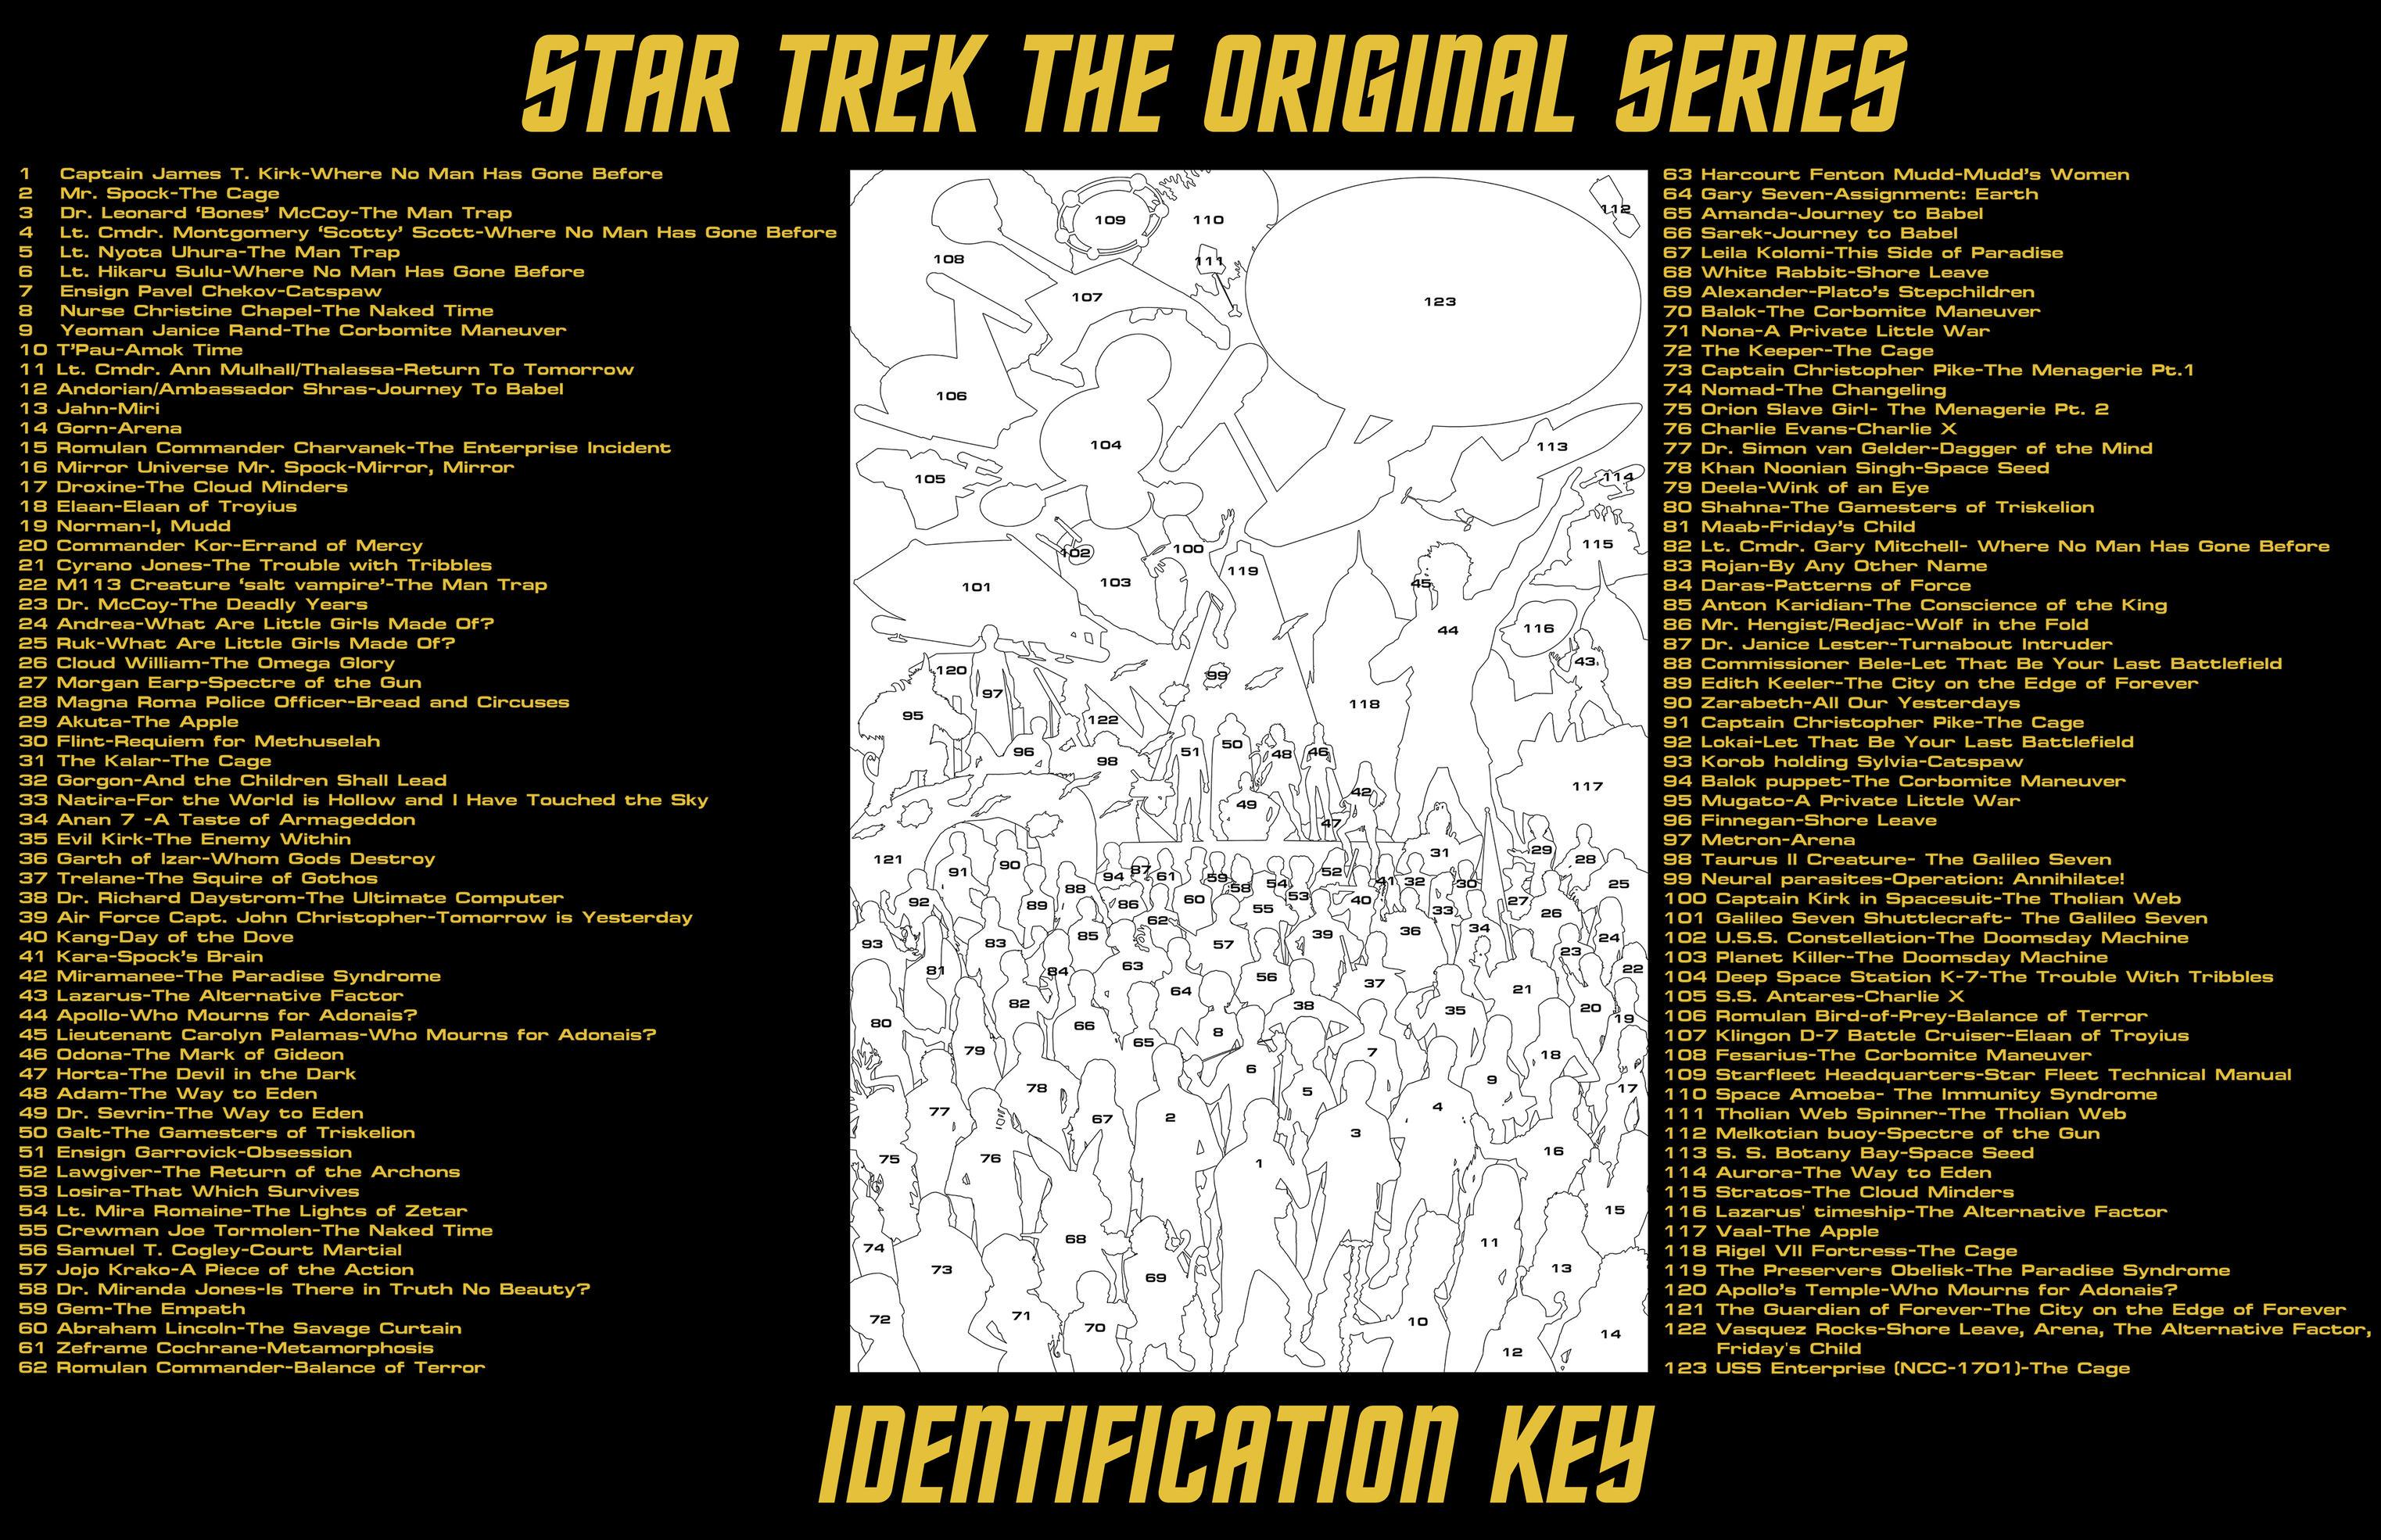 Classic Star Trek Key by dusty-abell